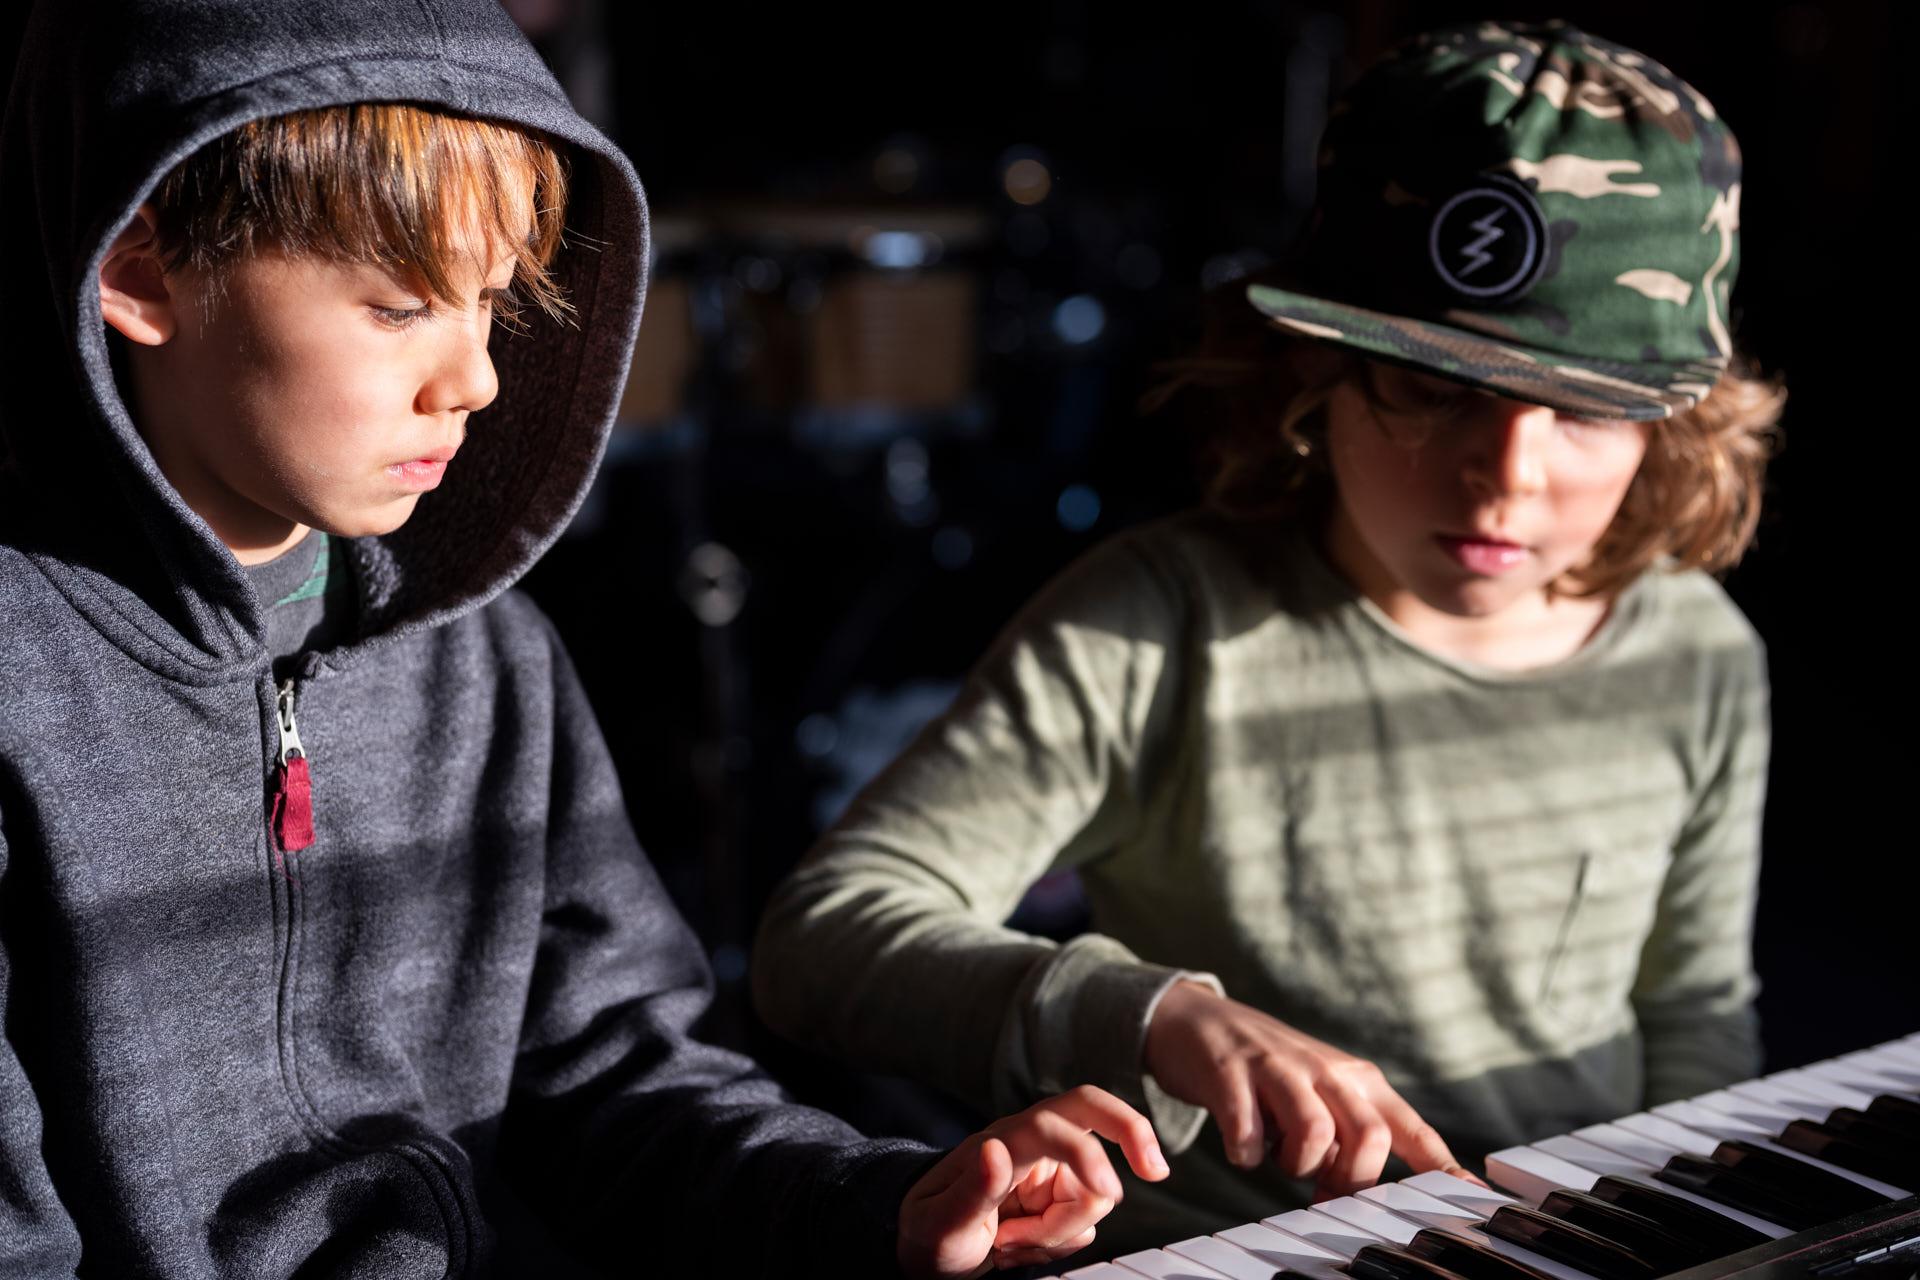 school-of-rock-teaches-the-universal-language-of-music-7